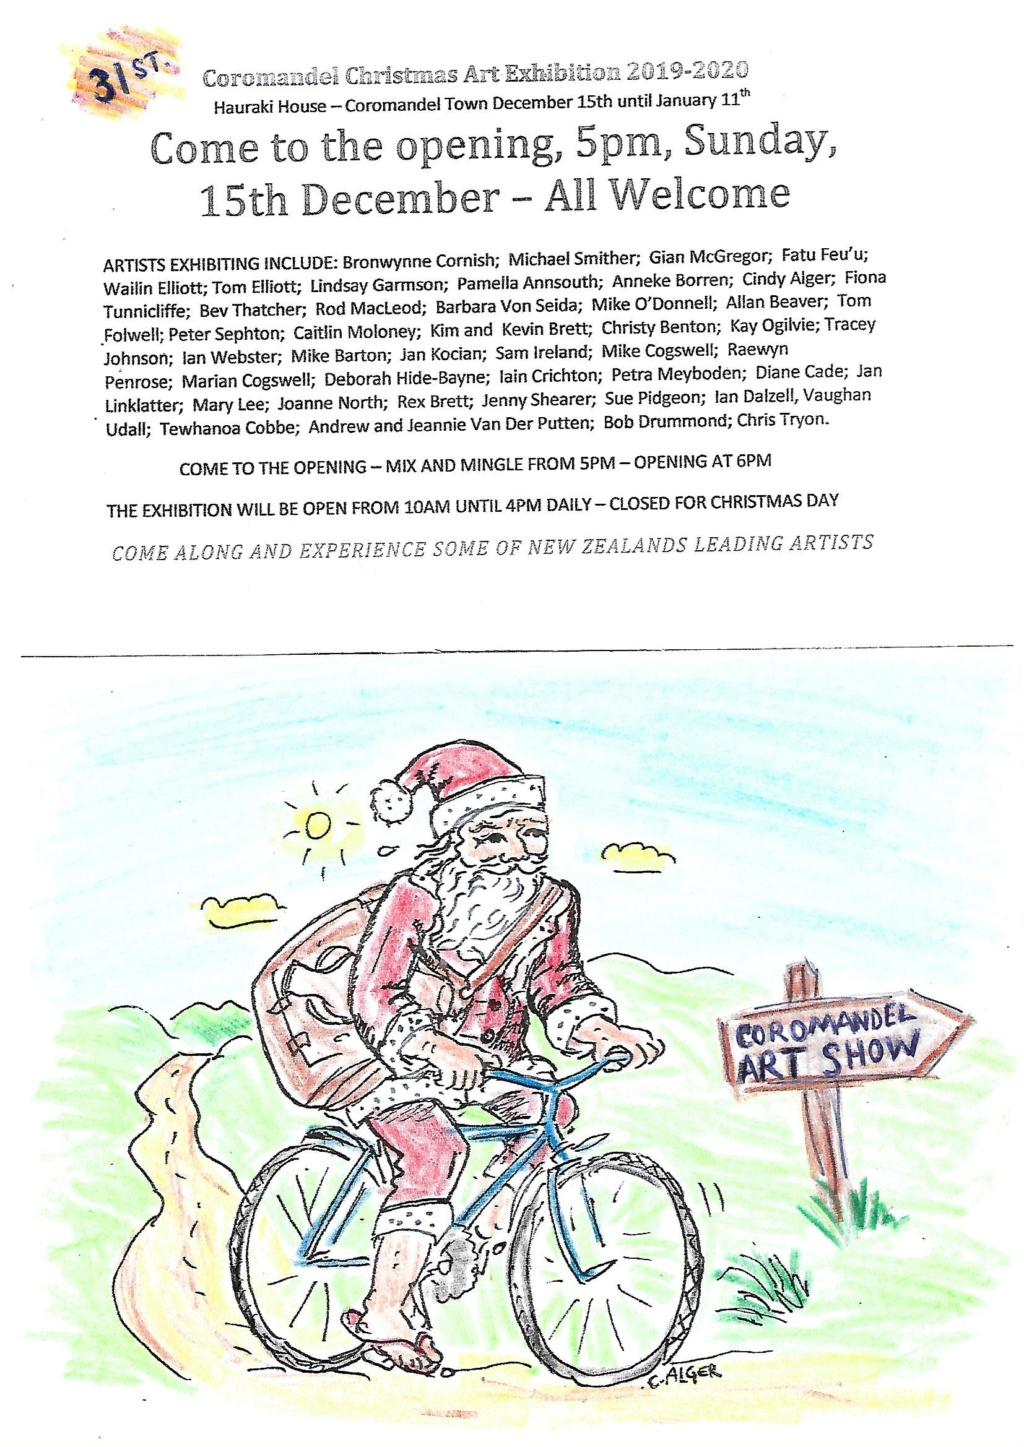 The 31st Coromandel Christmas Art Show starts 15th December Coro_310